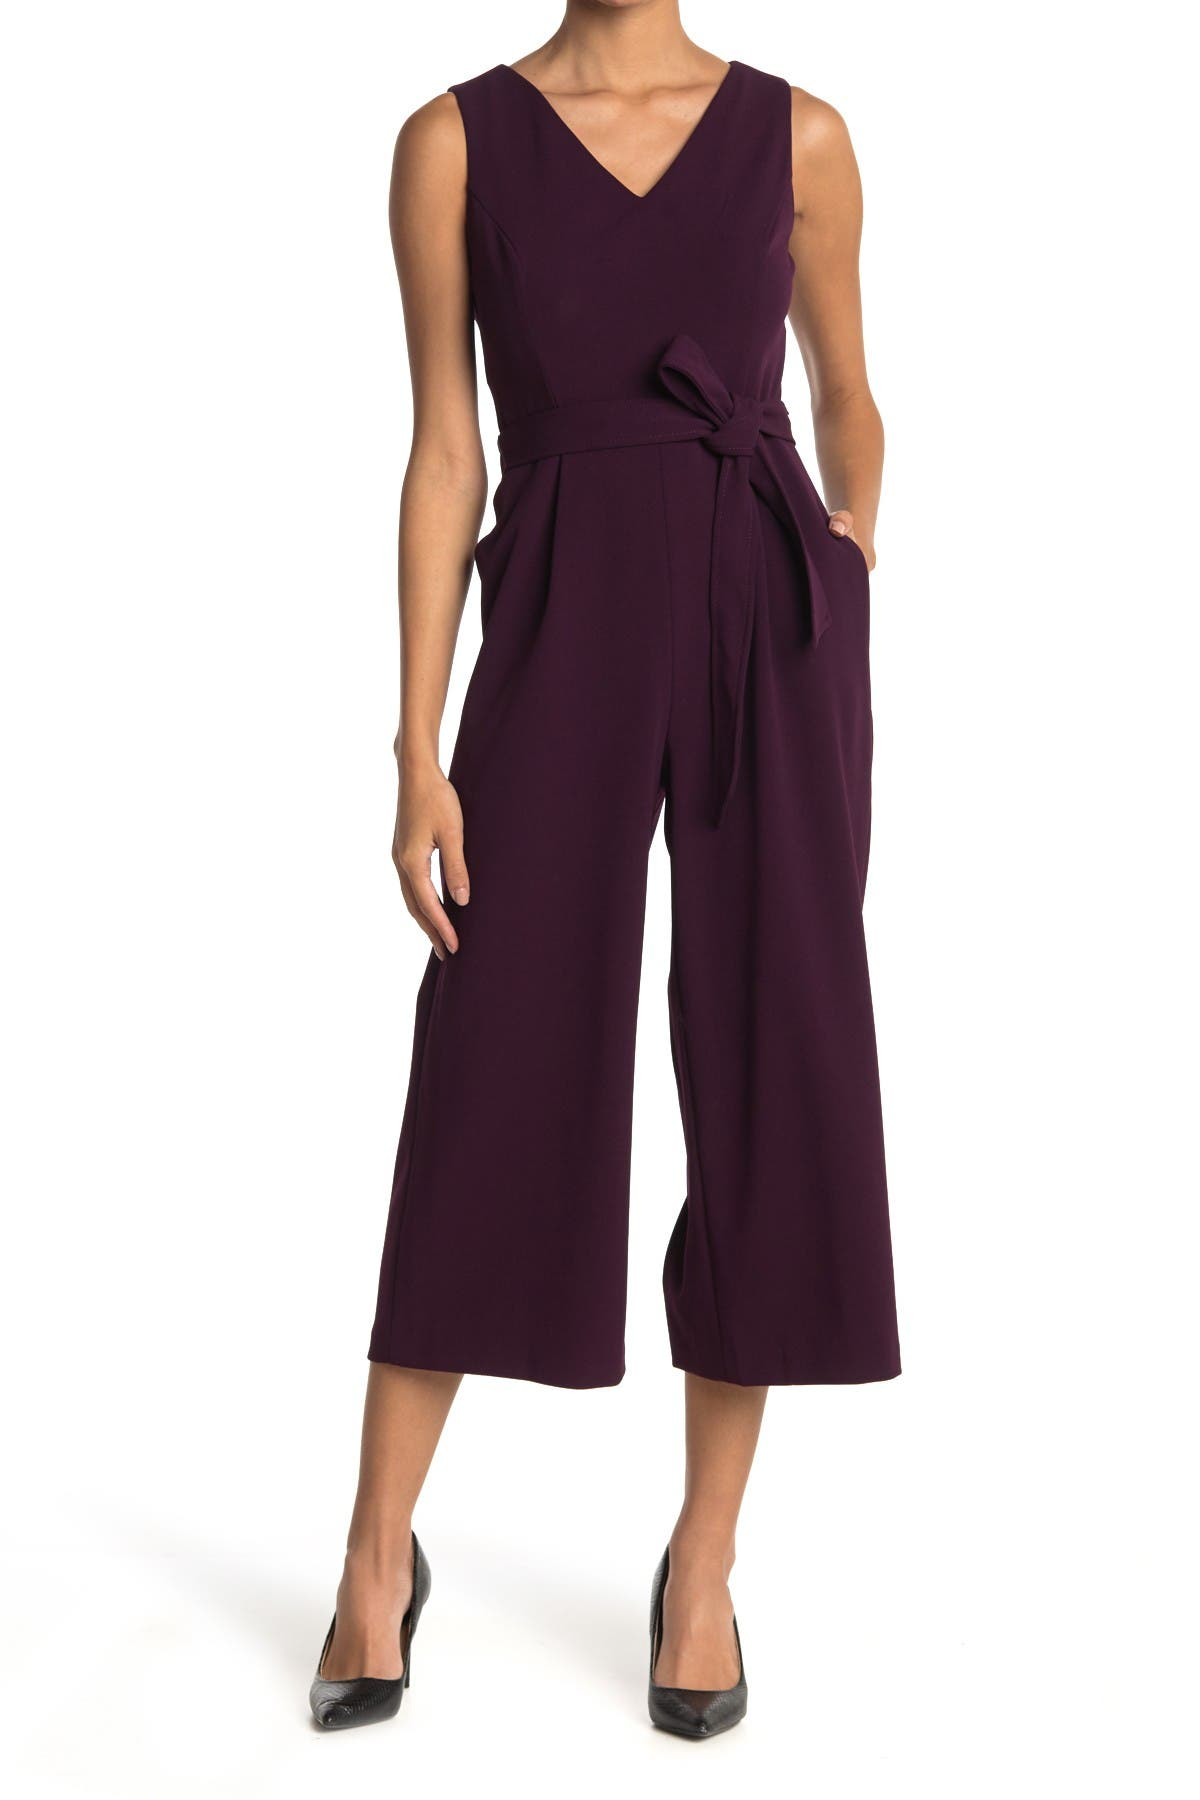 Image of Calvin Klein V-Neck Sleeveless Cropped Jumpsuit